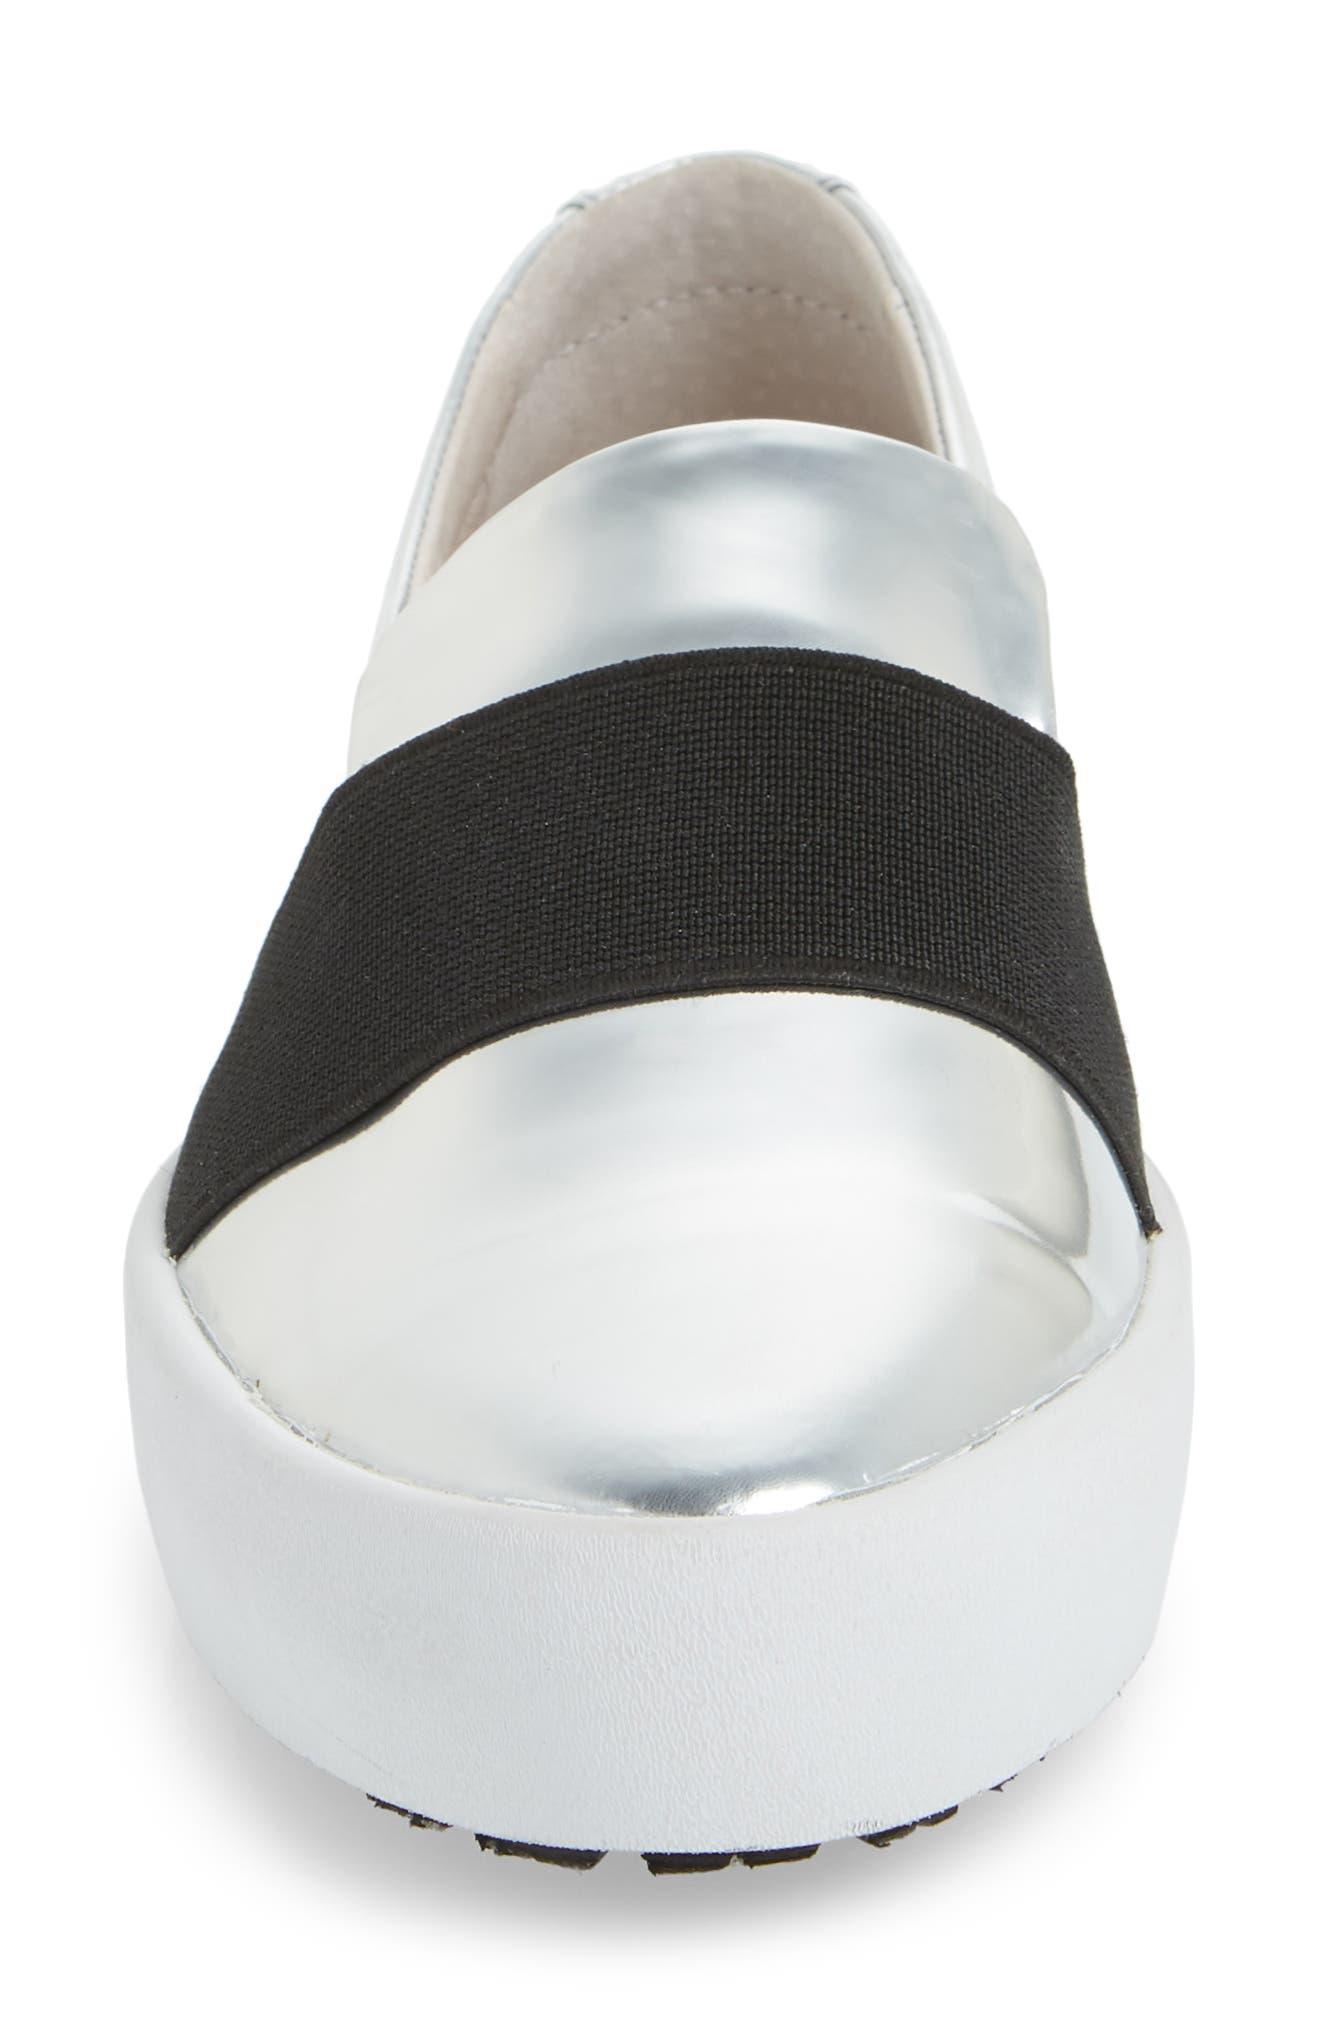 PL99 Slip-On Sneaker,                             Alternate thumbnail 4, color,                             Silver Leather